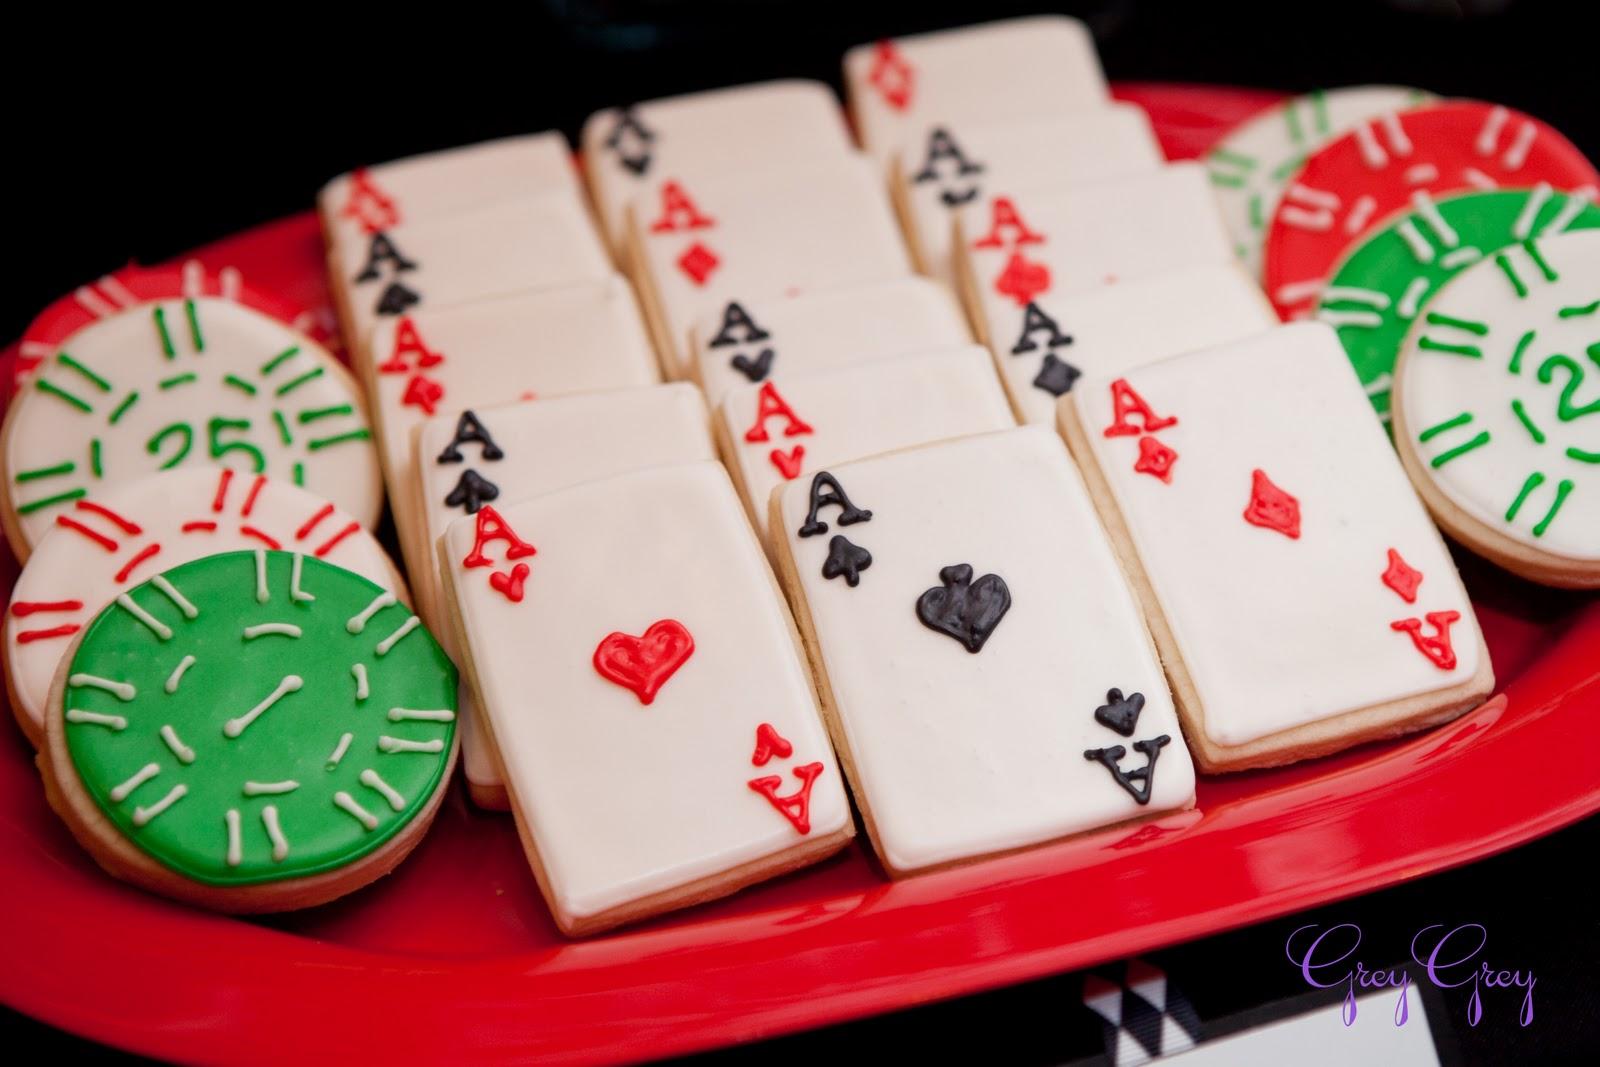 greygrey designs   my parties  casino 40th birthday party